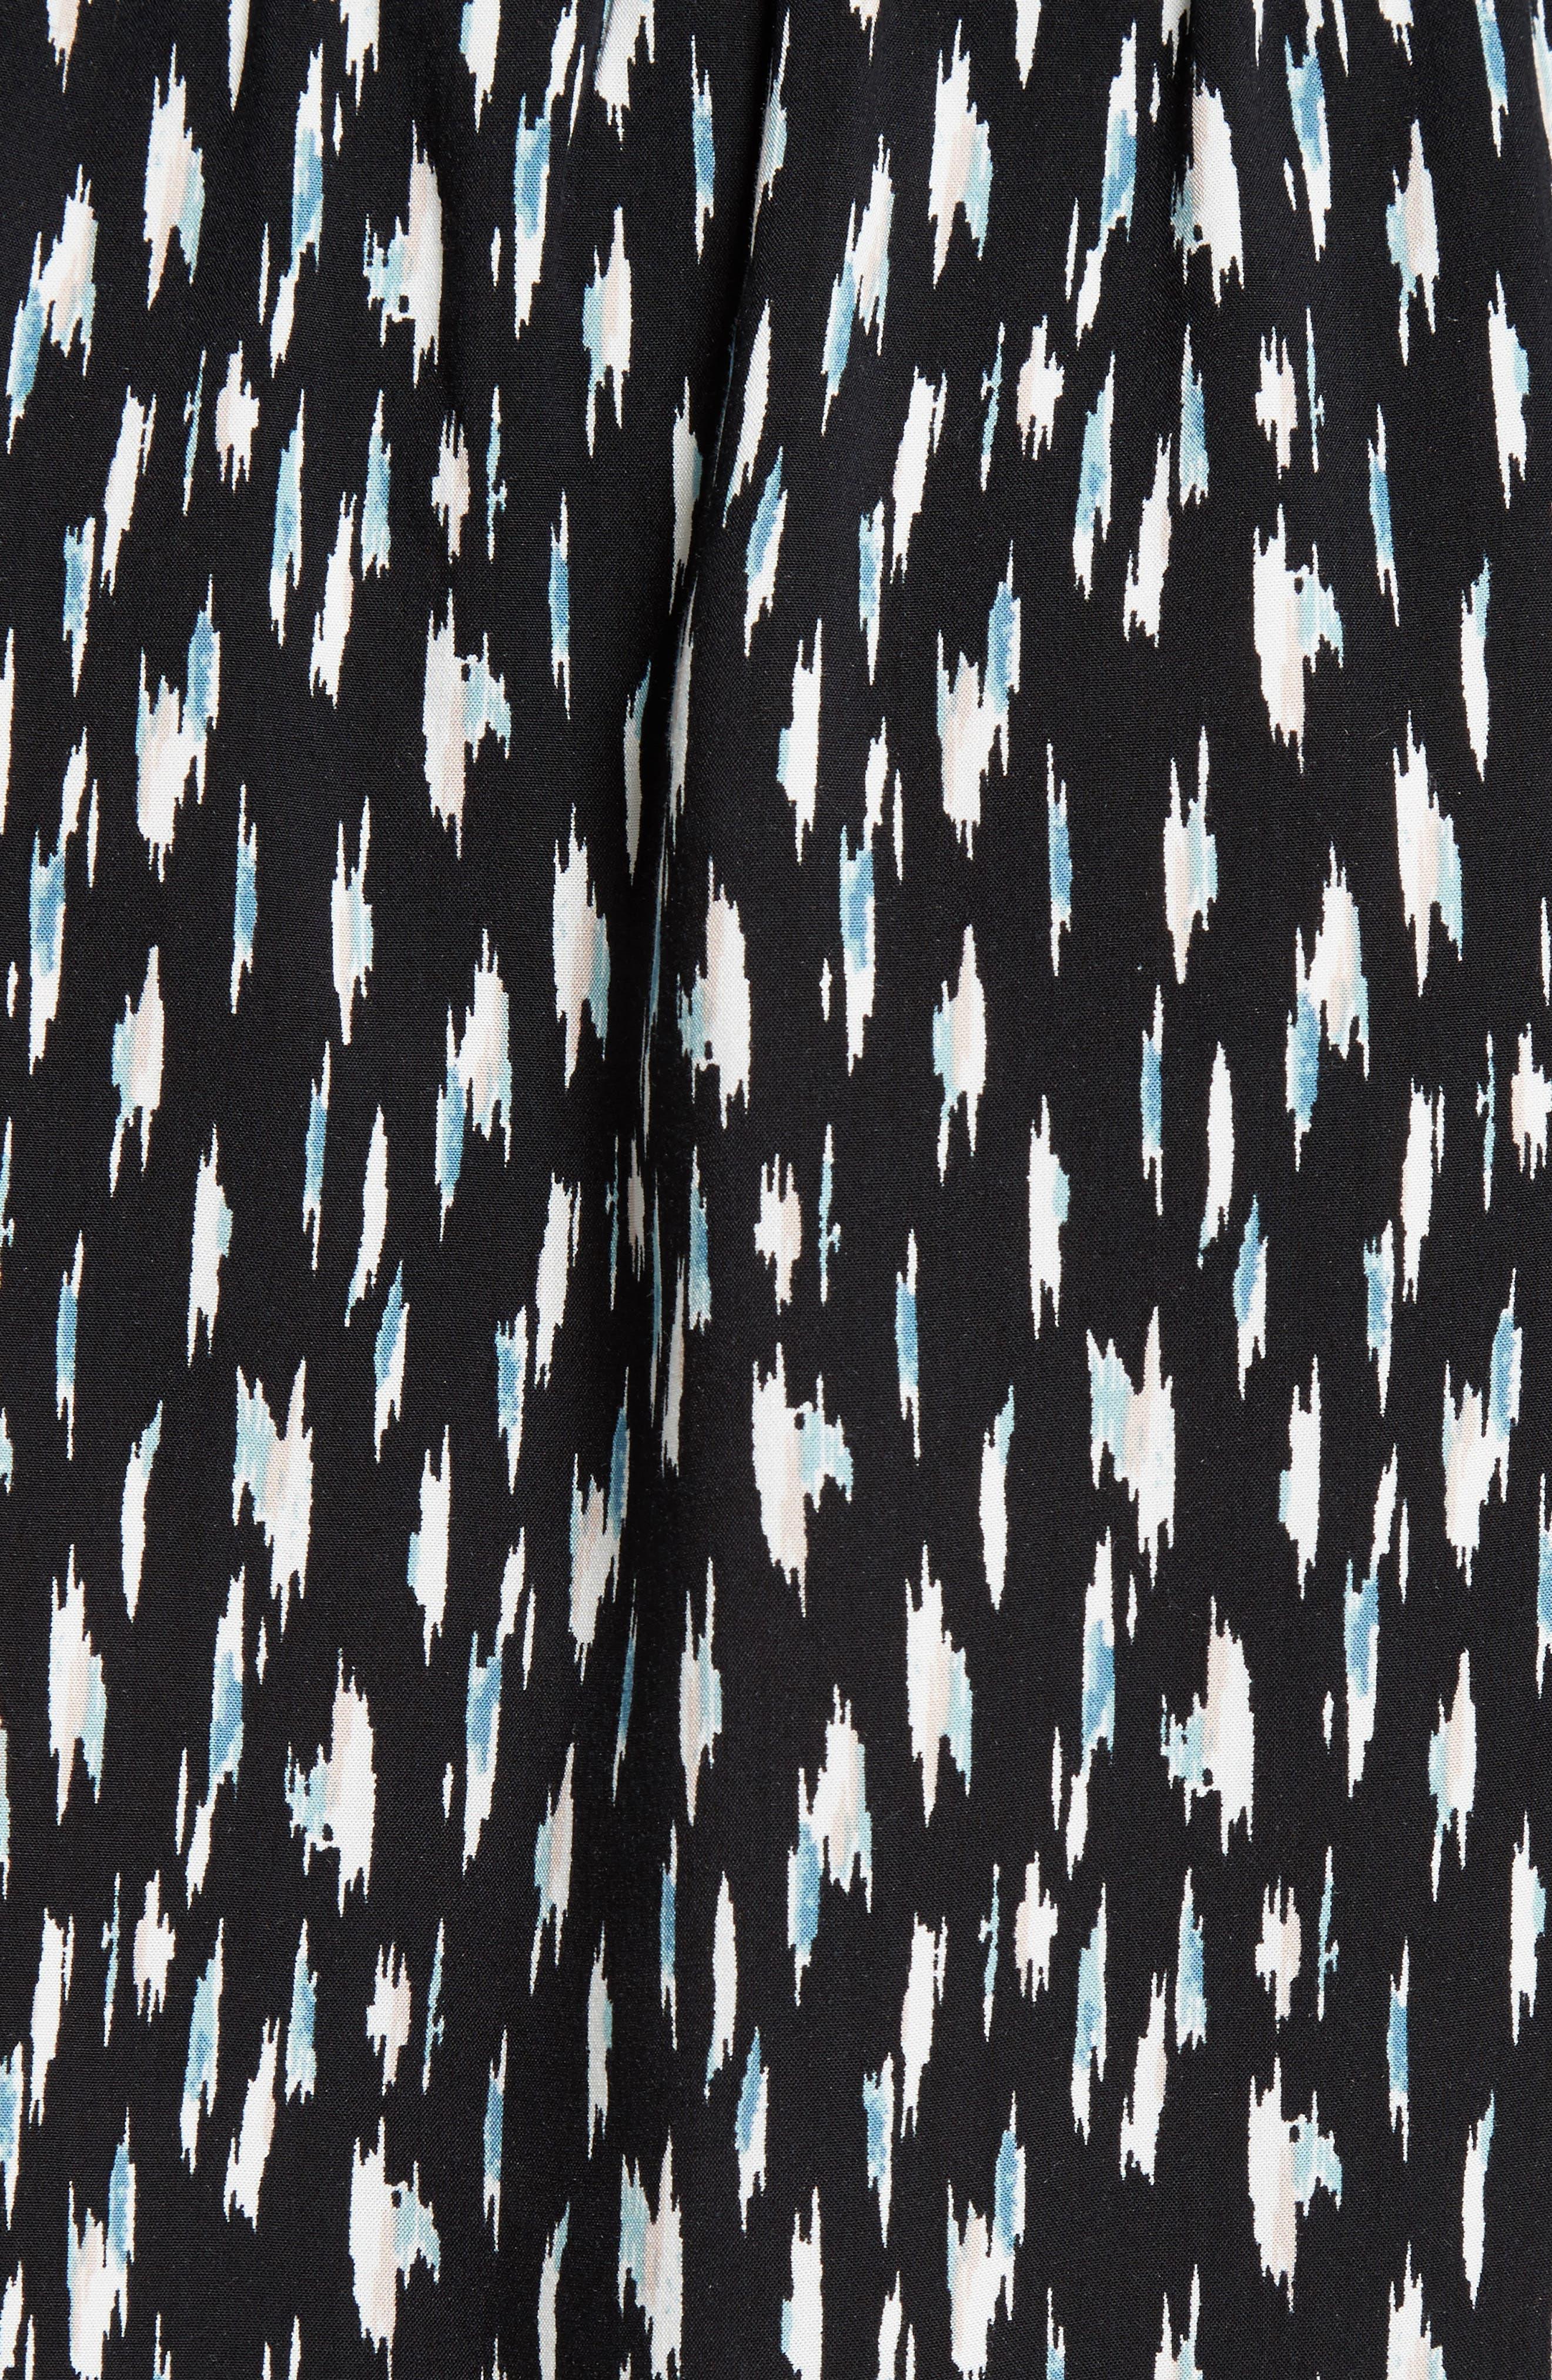 Joie Cassina Print Shirtdress,                             Alternate thumbnail 5, color,                             Caviar